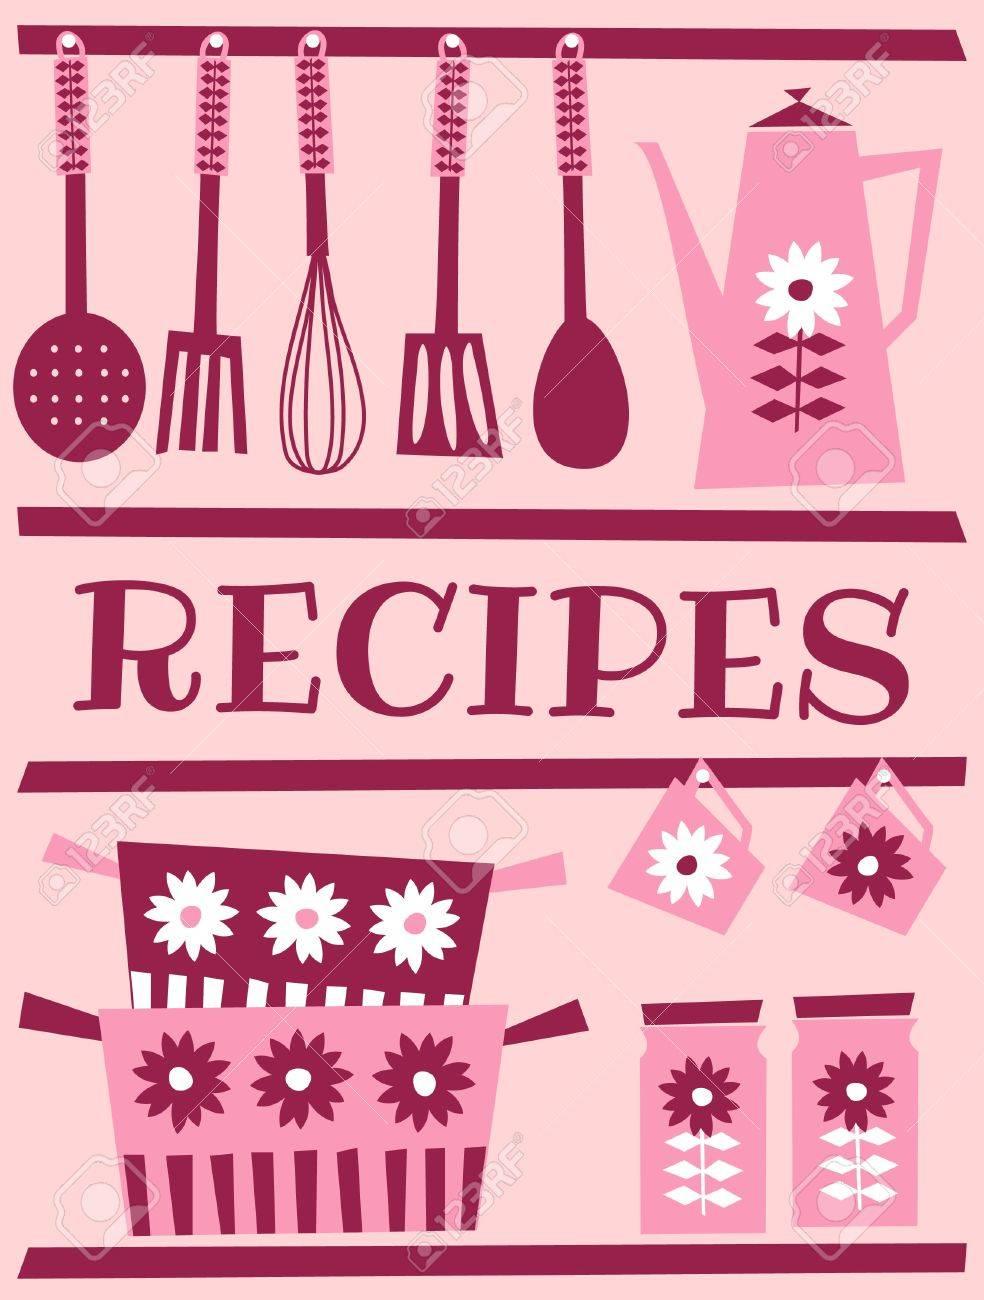 Retro Style Kitchen Accessories Illustration Of Kitchen Accessories In Retro Style Recipe Card